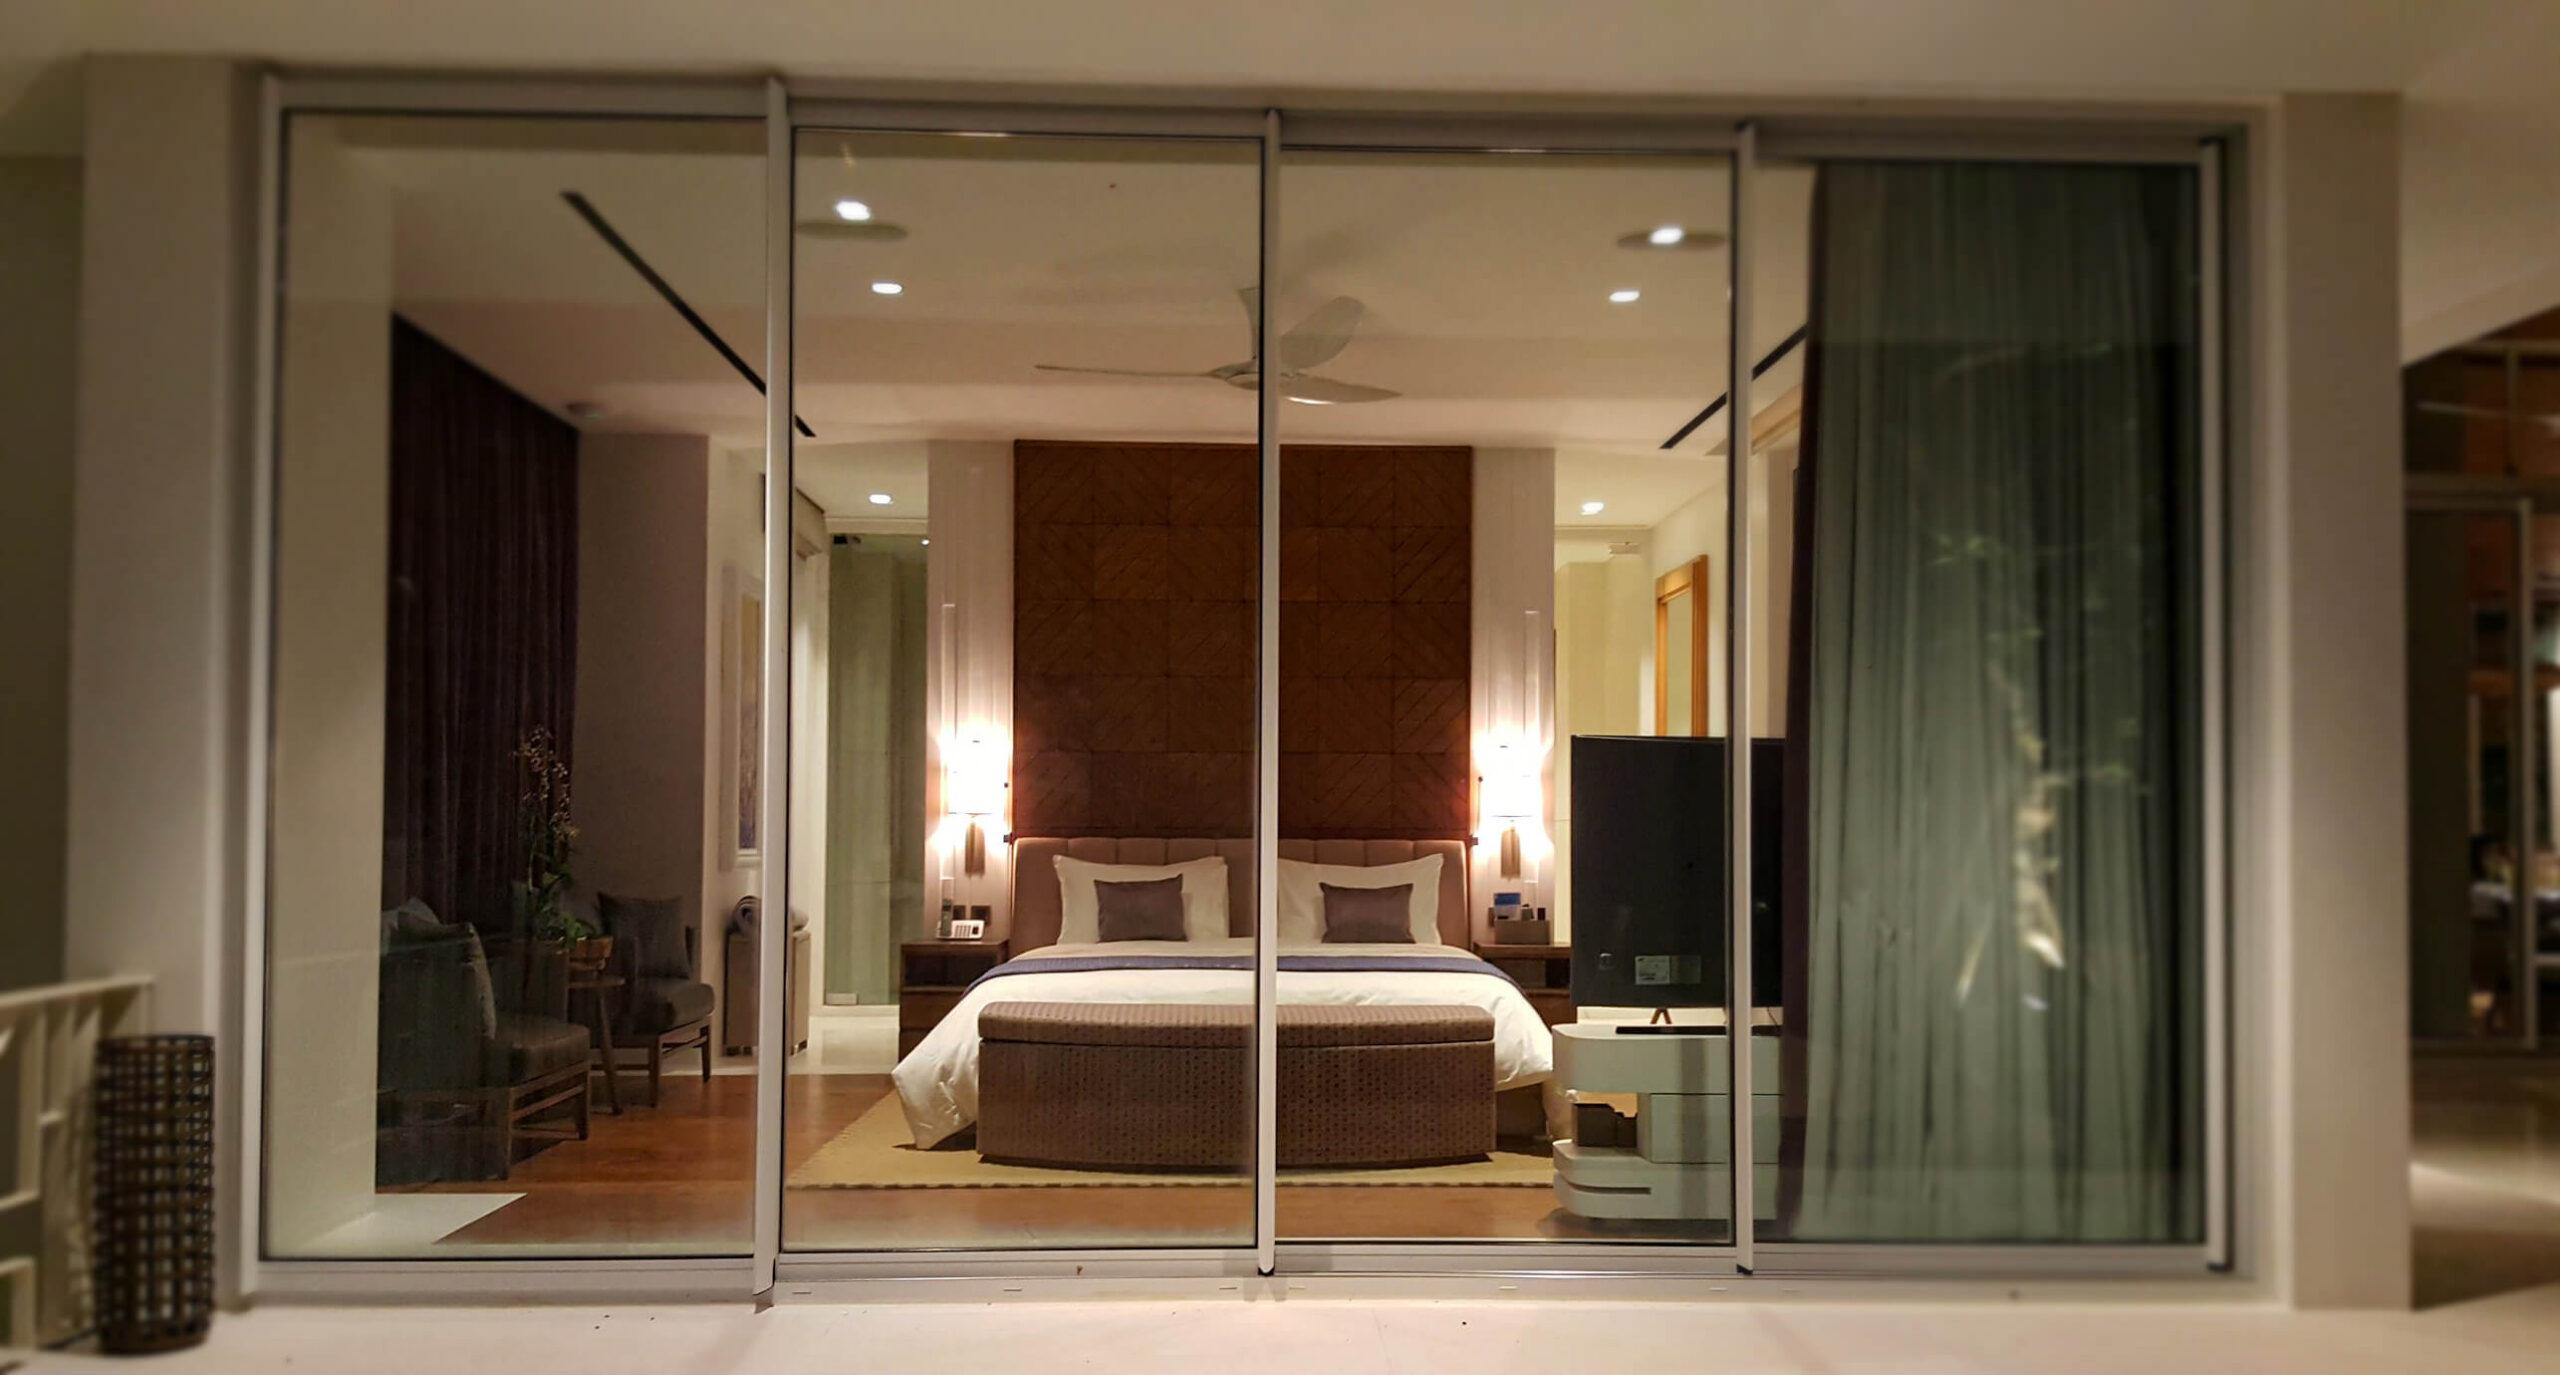 bali vila bedroom lighting